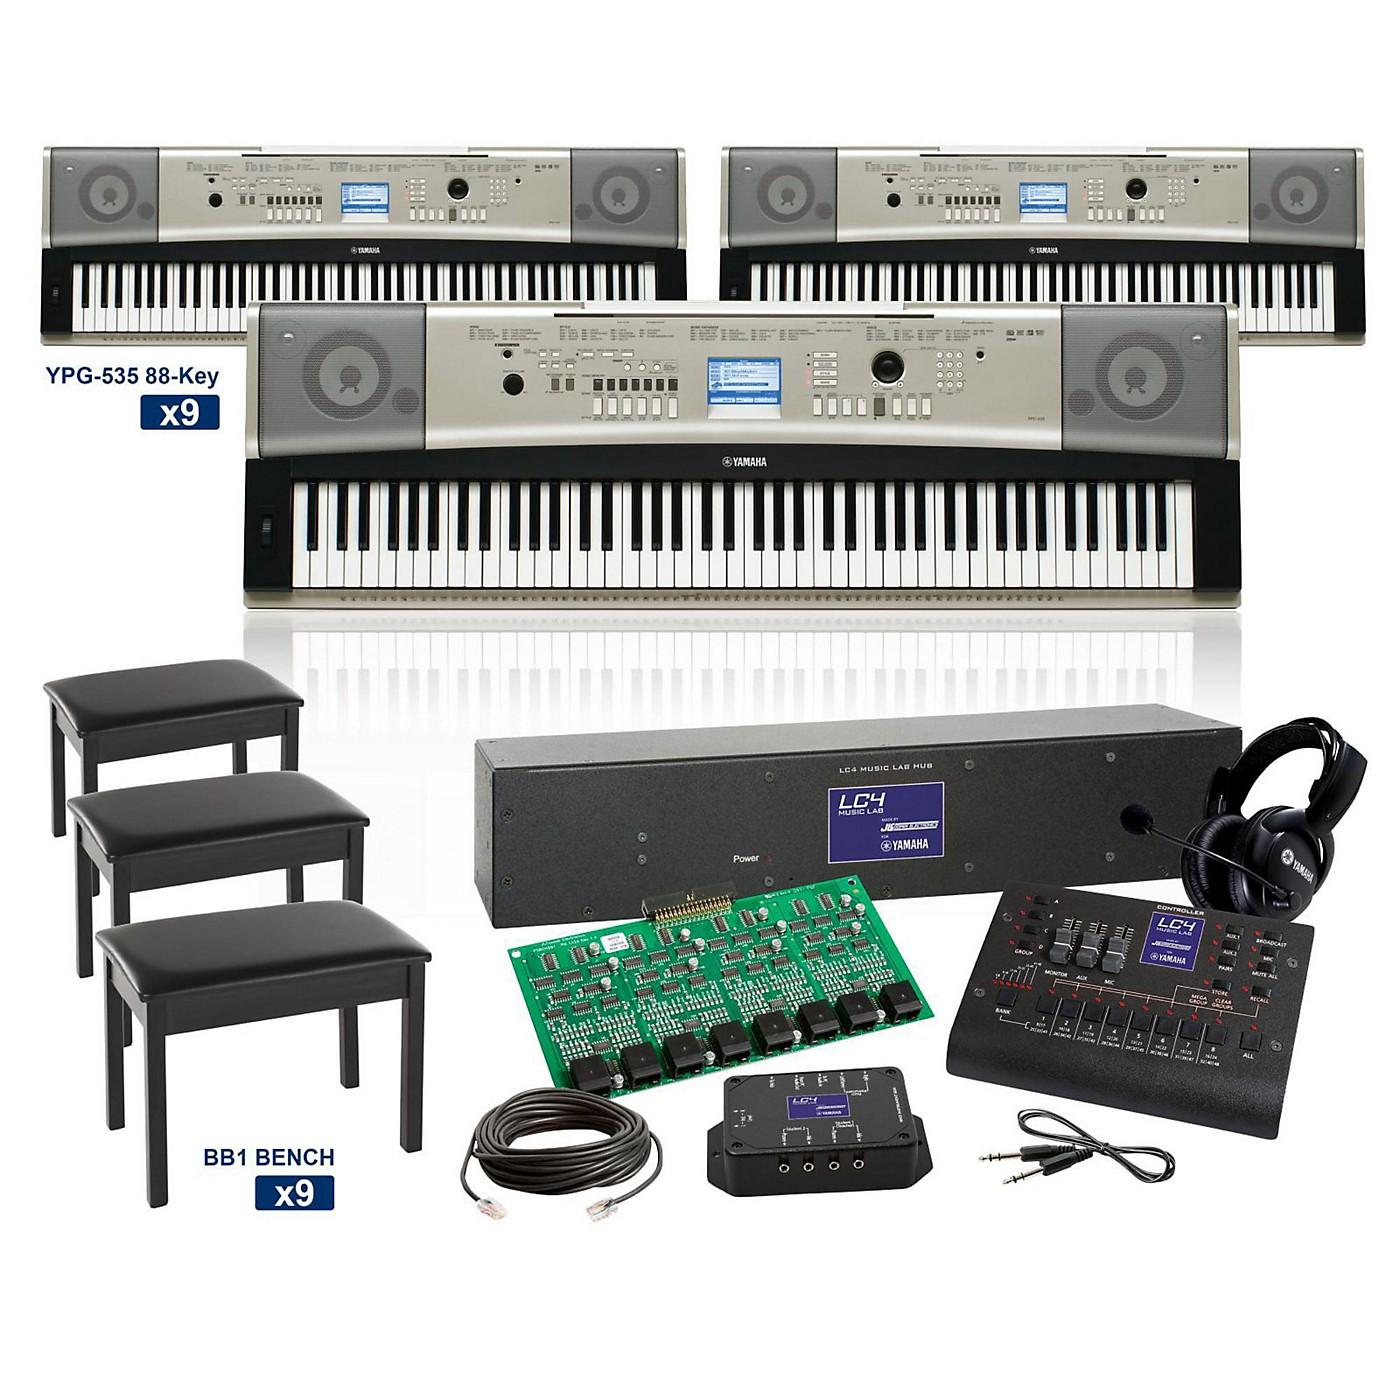 Yamaha YPG-535 88-Key Grand LC4 Keyboard Lab thumbnail